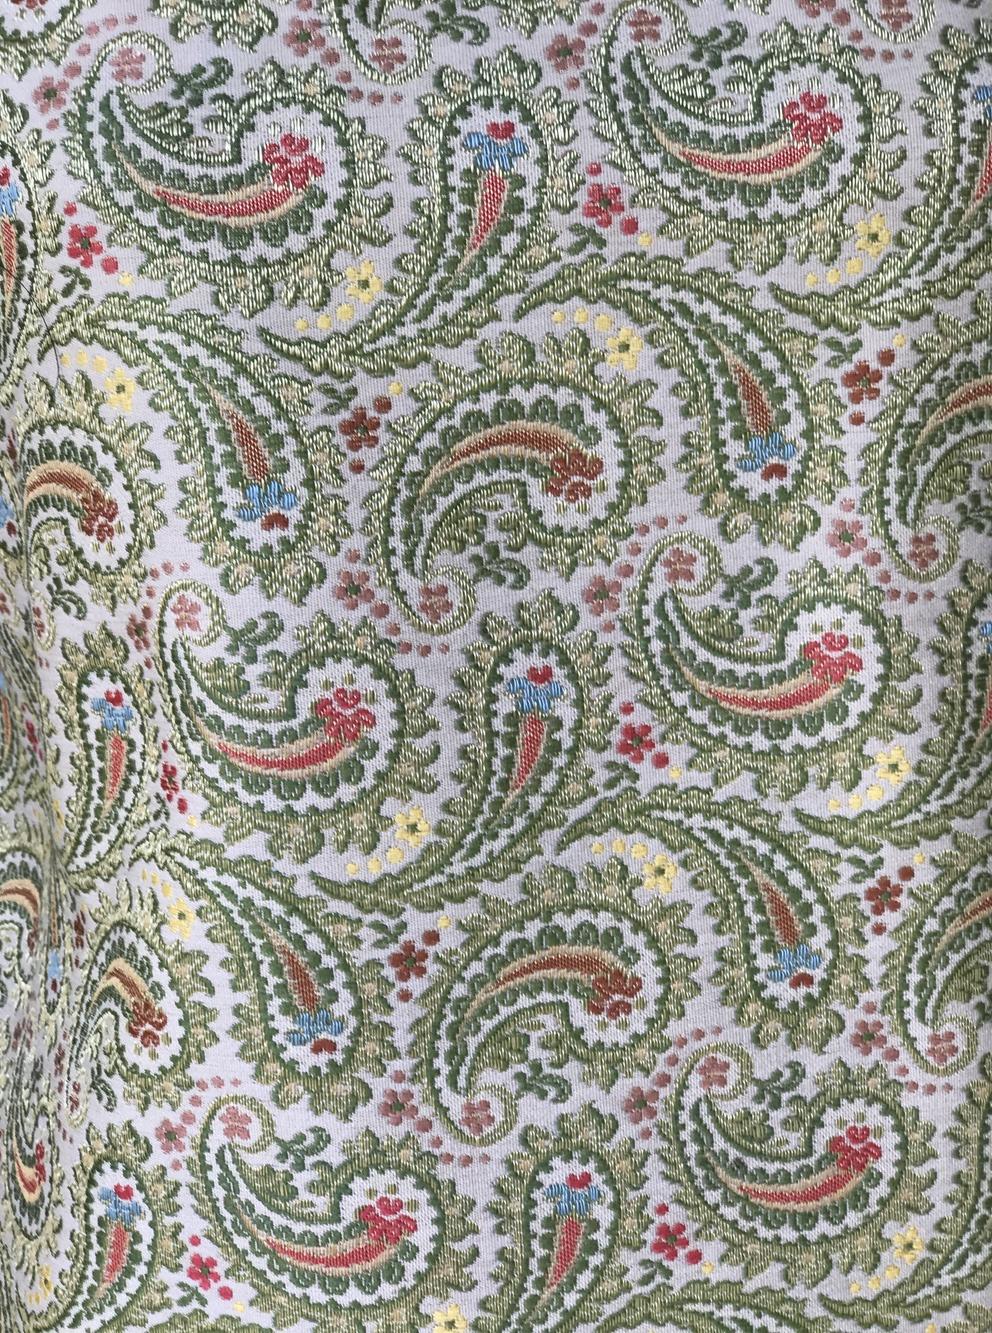 brocade fabric paisley design metallic thread regency redingote baroque floral made in italy